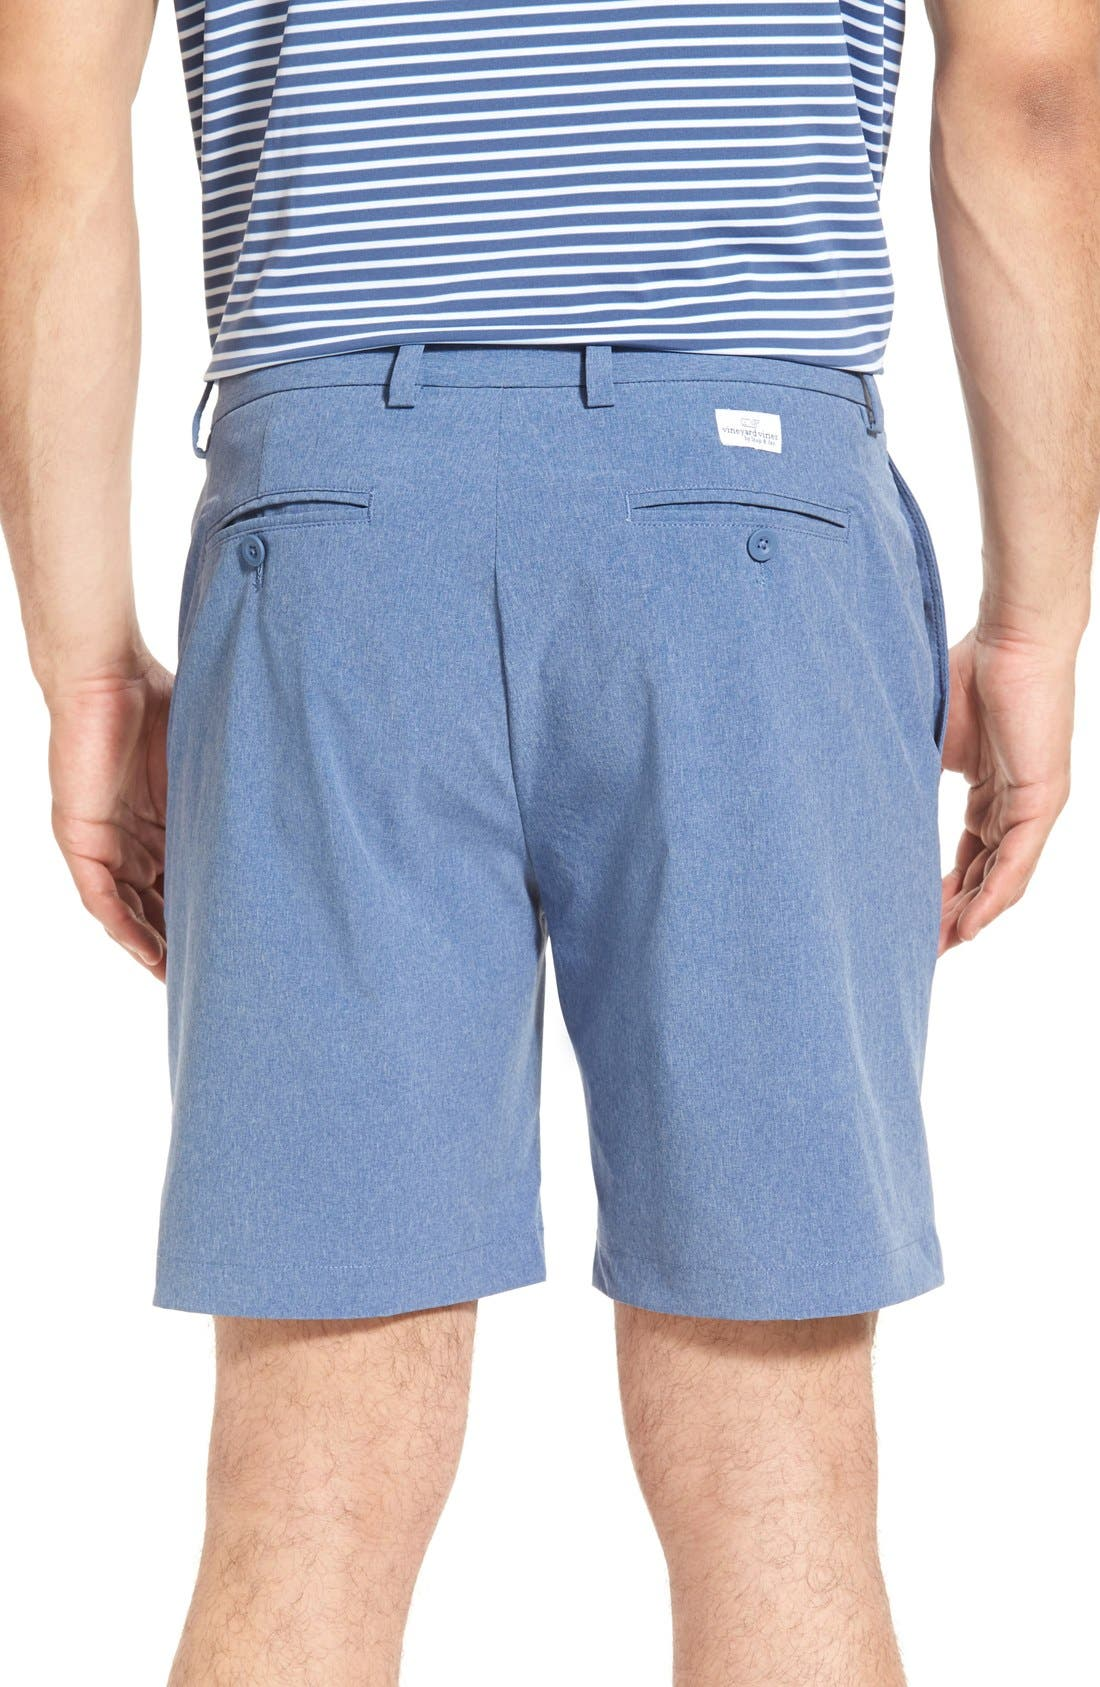 8 Inch Performance Breaker Shorts,                             Alternate thumbnail 55, color,